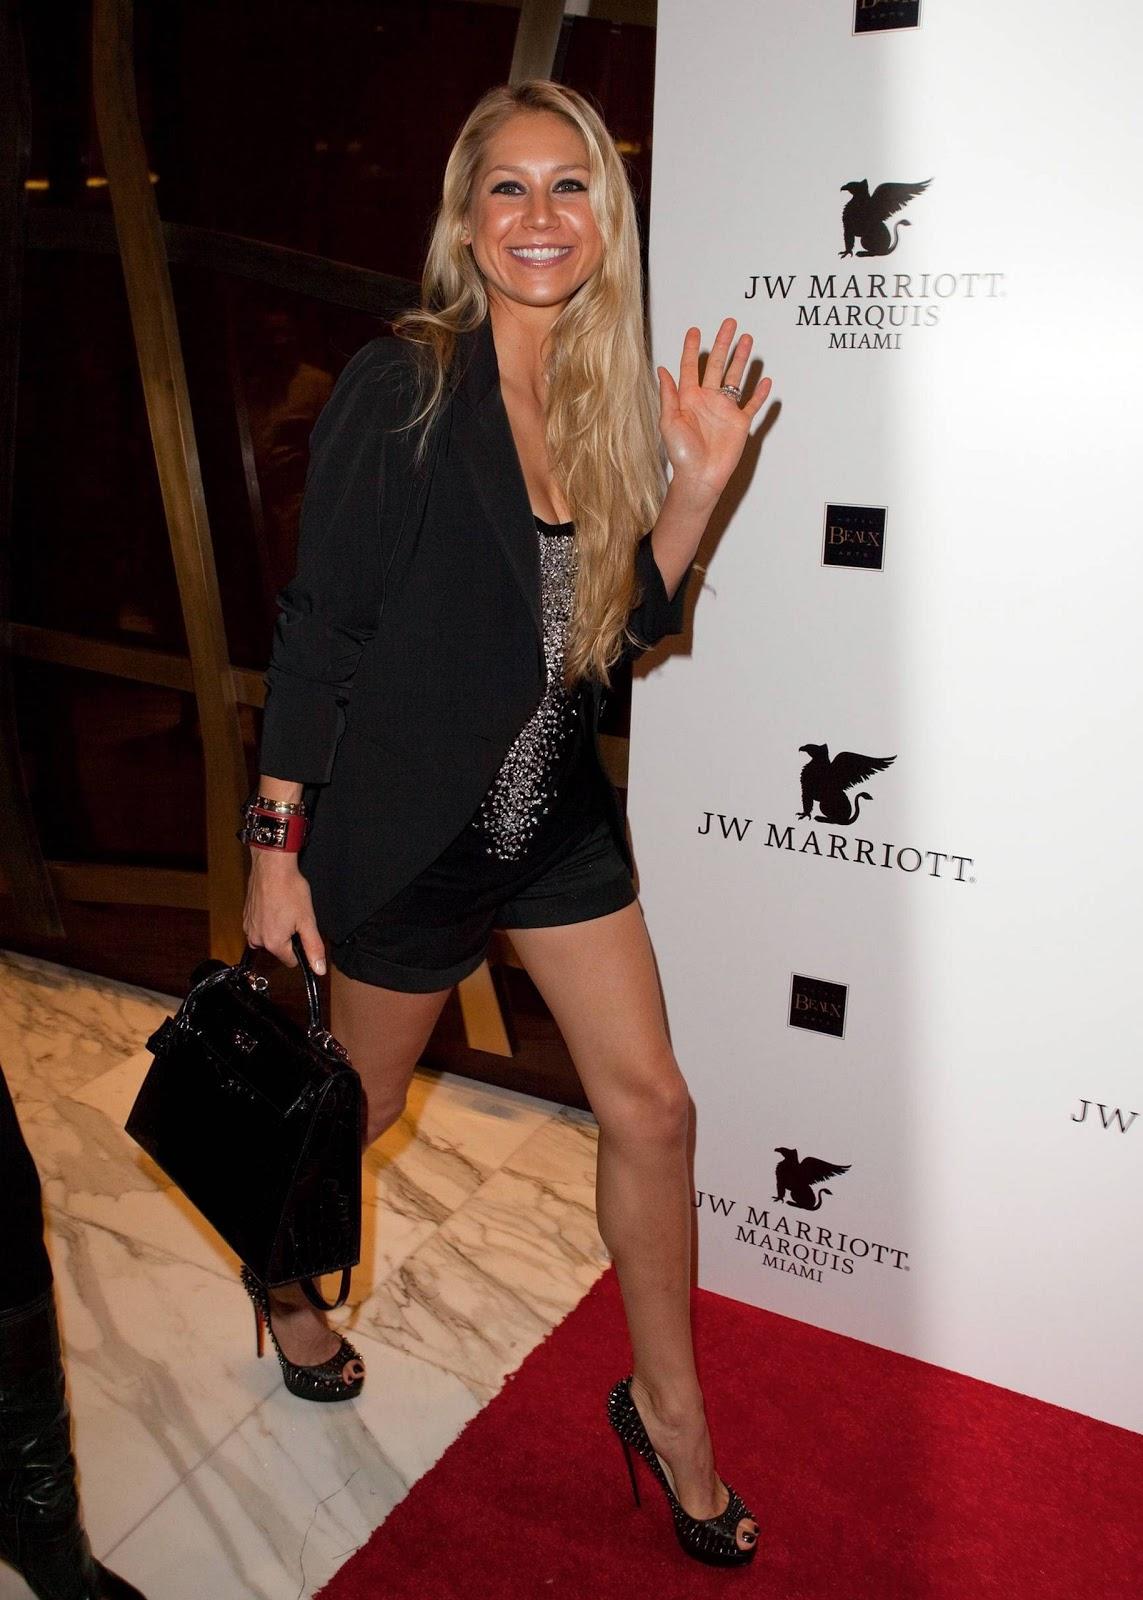 http://4.bp.blogspot.com/-P2cMMwC7u-M/TbaY3SbSMFI/AAAAAAAAAYE/eCA2iEy8IGg/s1600/Anna+Kournikova_Bikini-HQ+%25285%2529.jpg